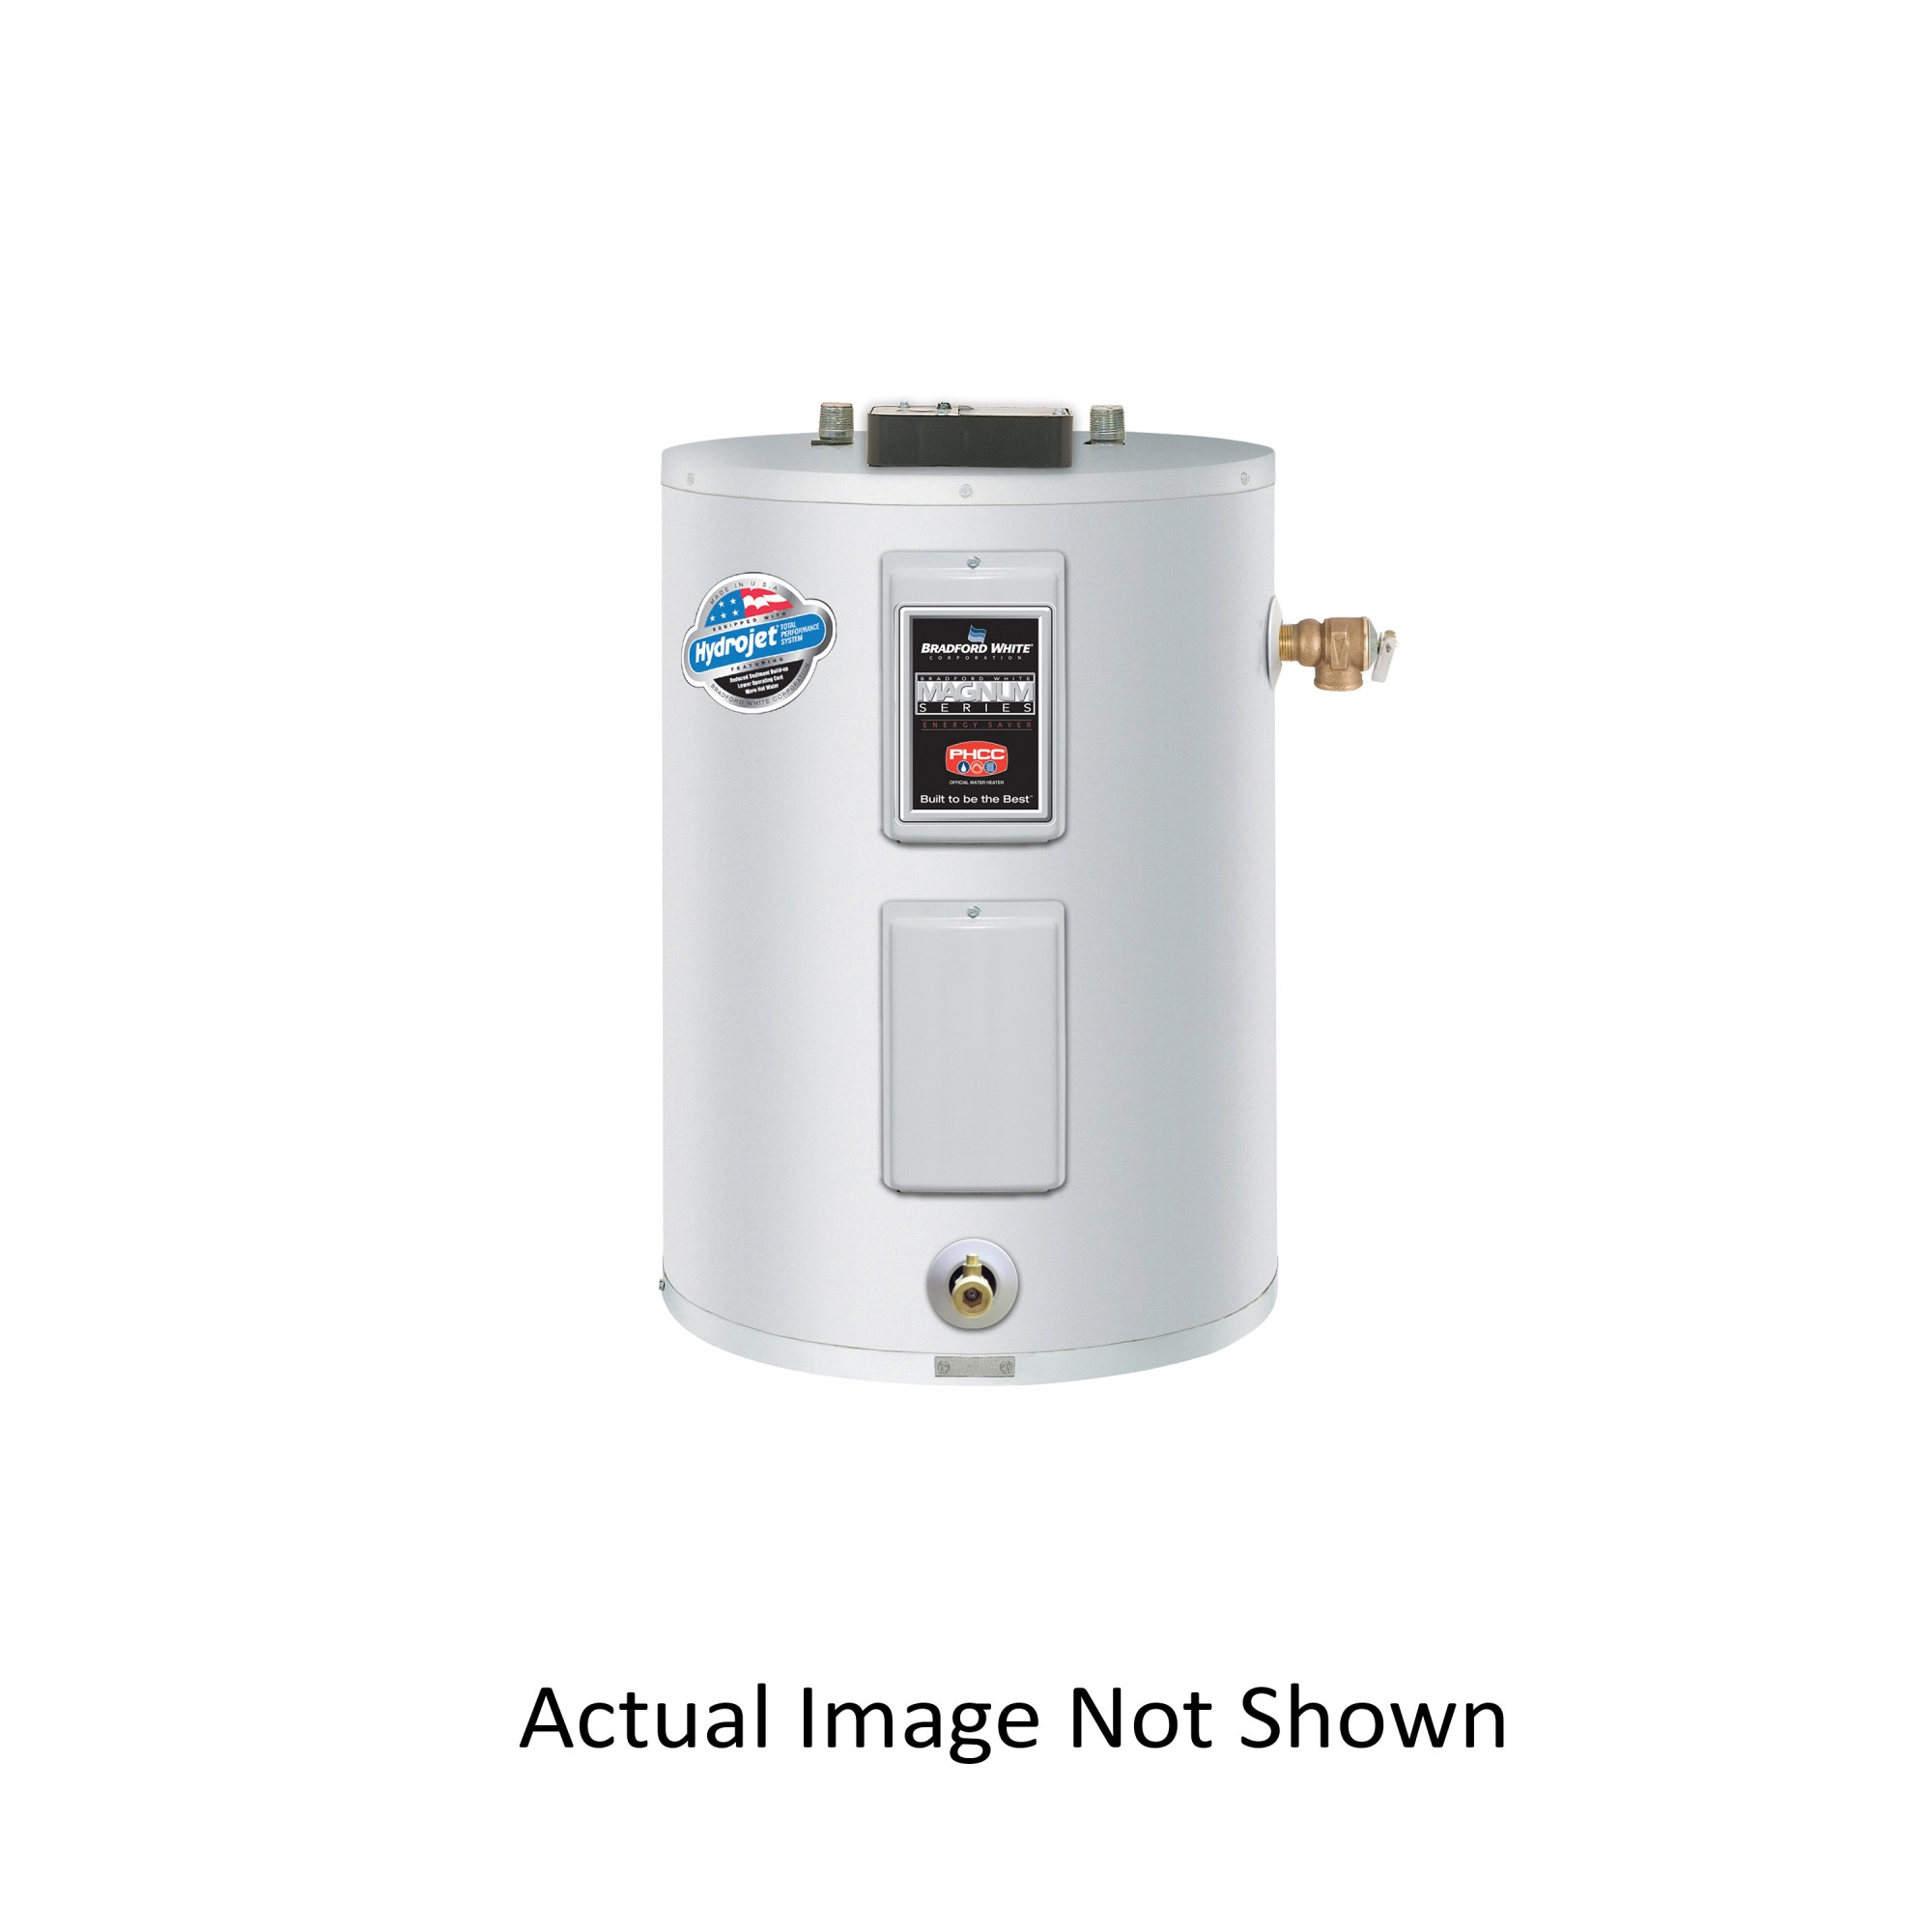 hight resolution of bradford white electriflex ld le150l3 3nctt light duty lowboy electric water heater 47 gal tank 3000 w at 208 vac 4000 w at 240 vac 208 240 vac 3 ph